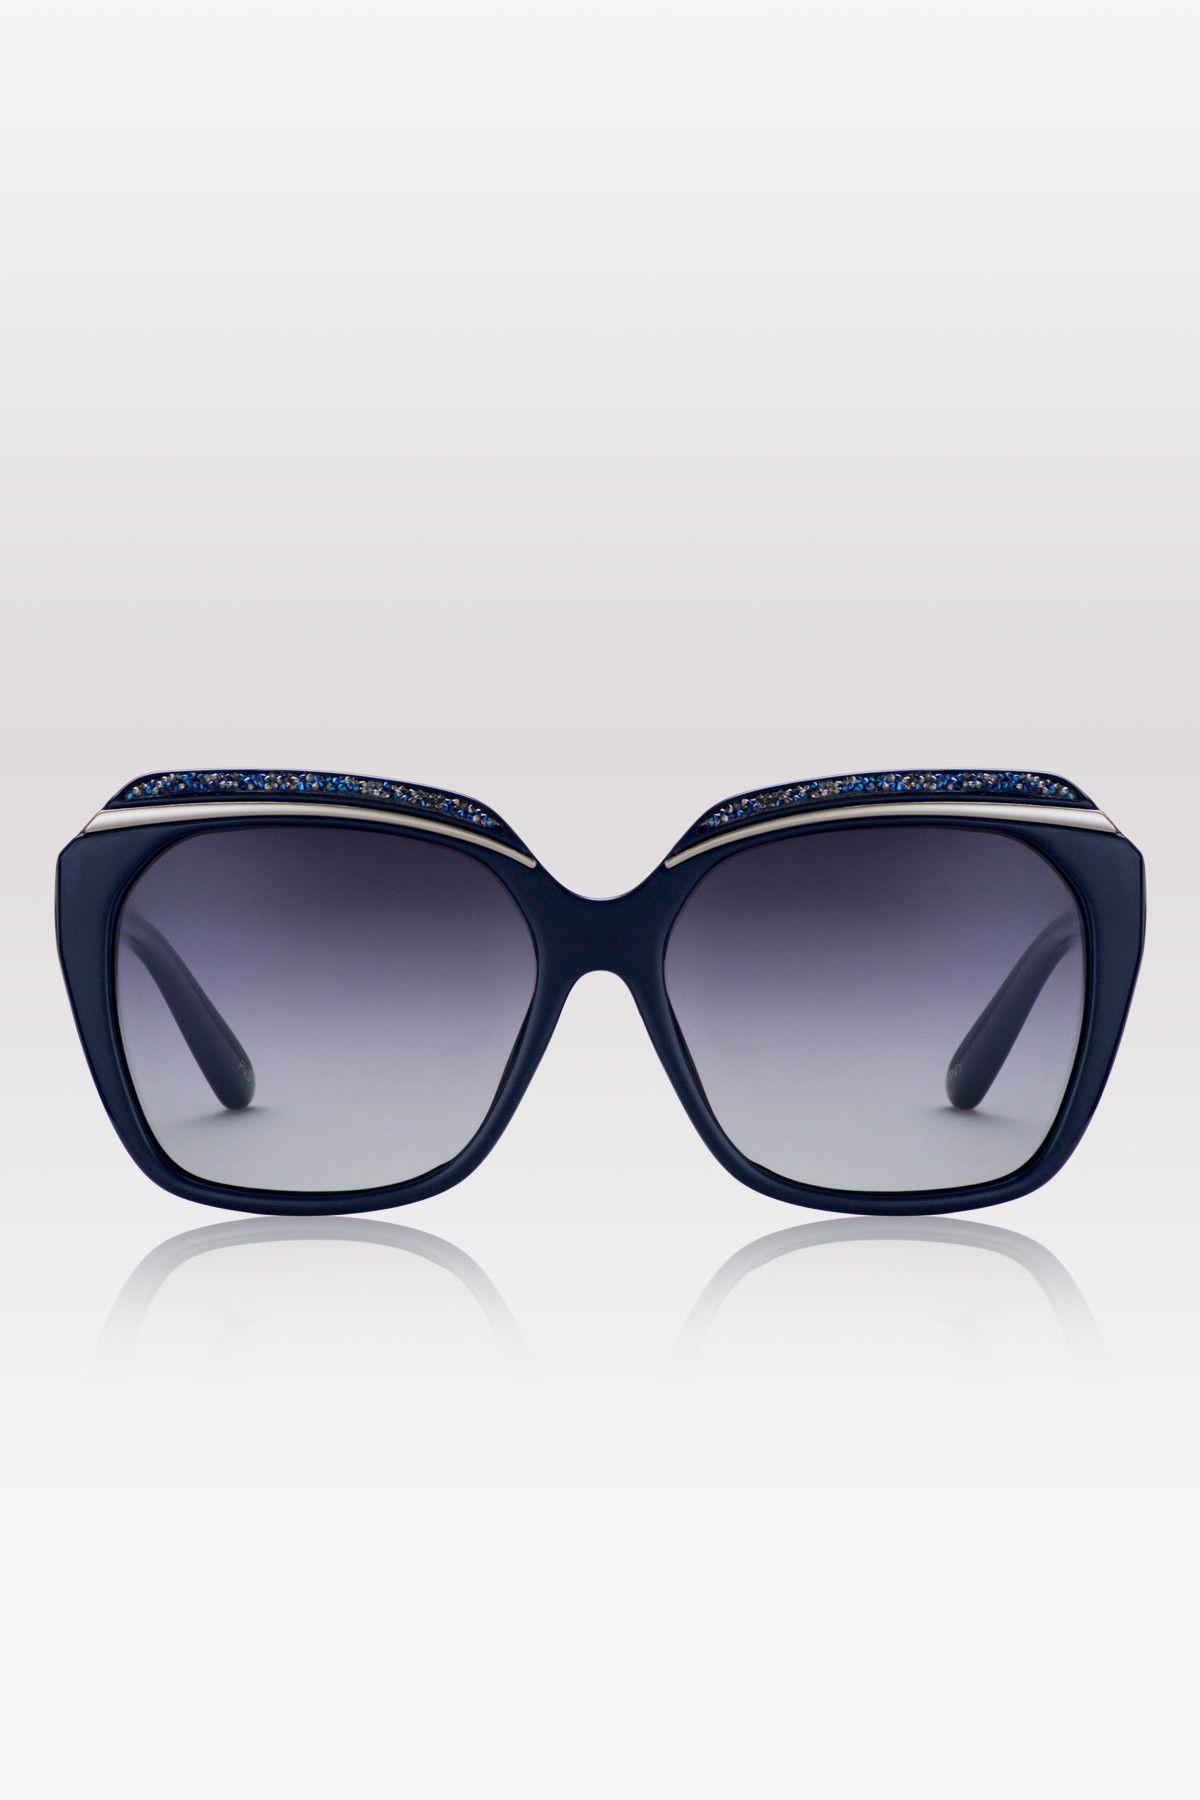 4206dd3de4008 DeMaris Oversize Square Sunglasses